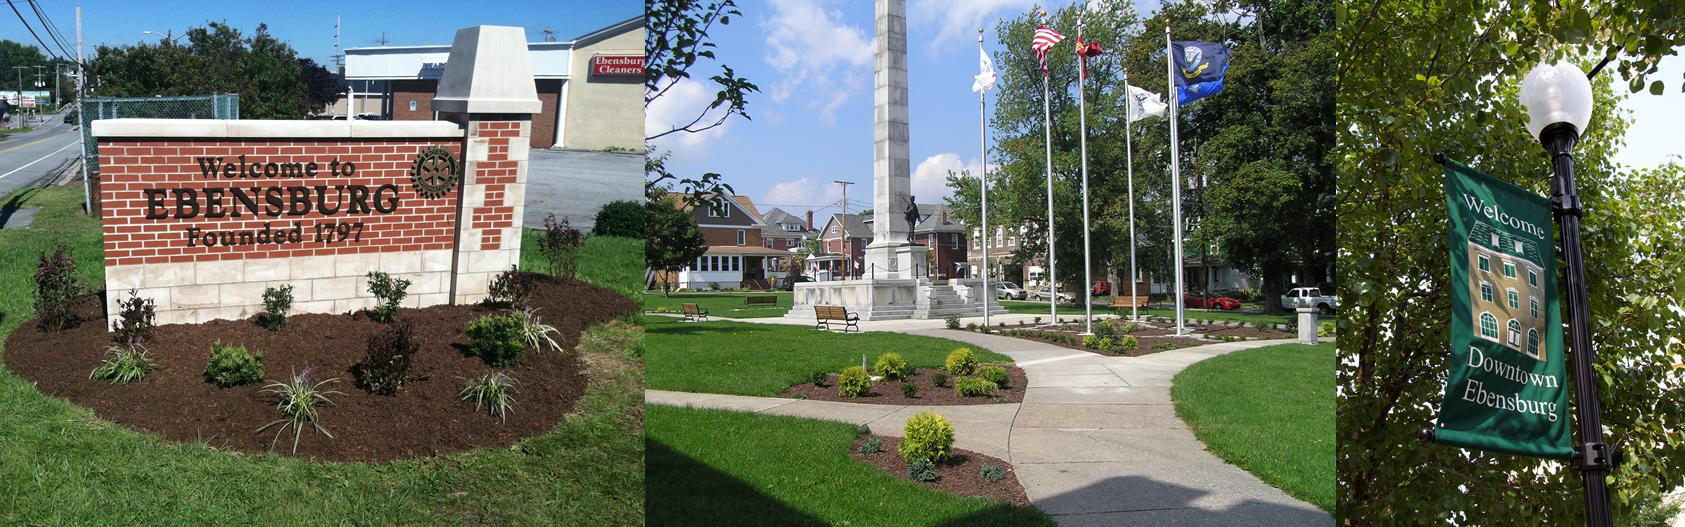 Visit Johnstown Pa | Ebensburg Main Street Partnership